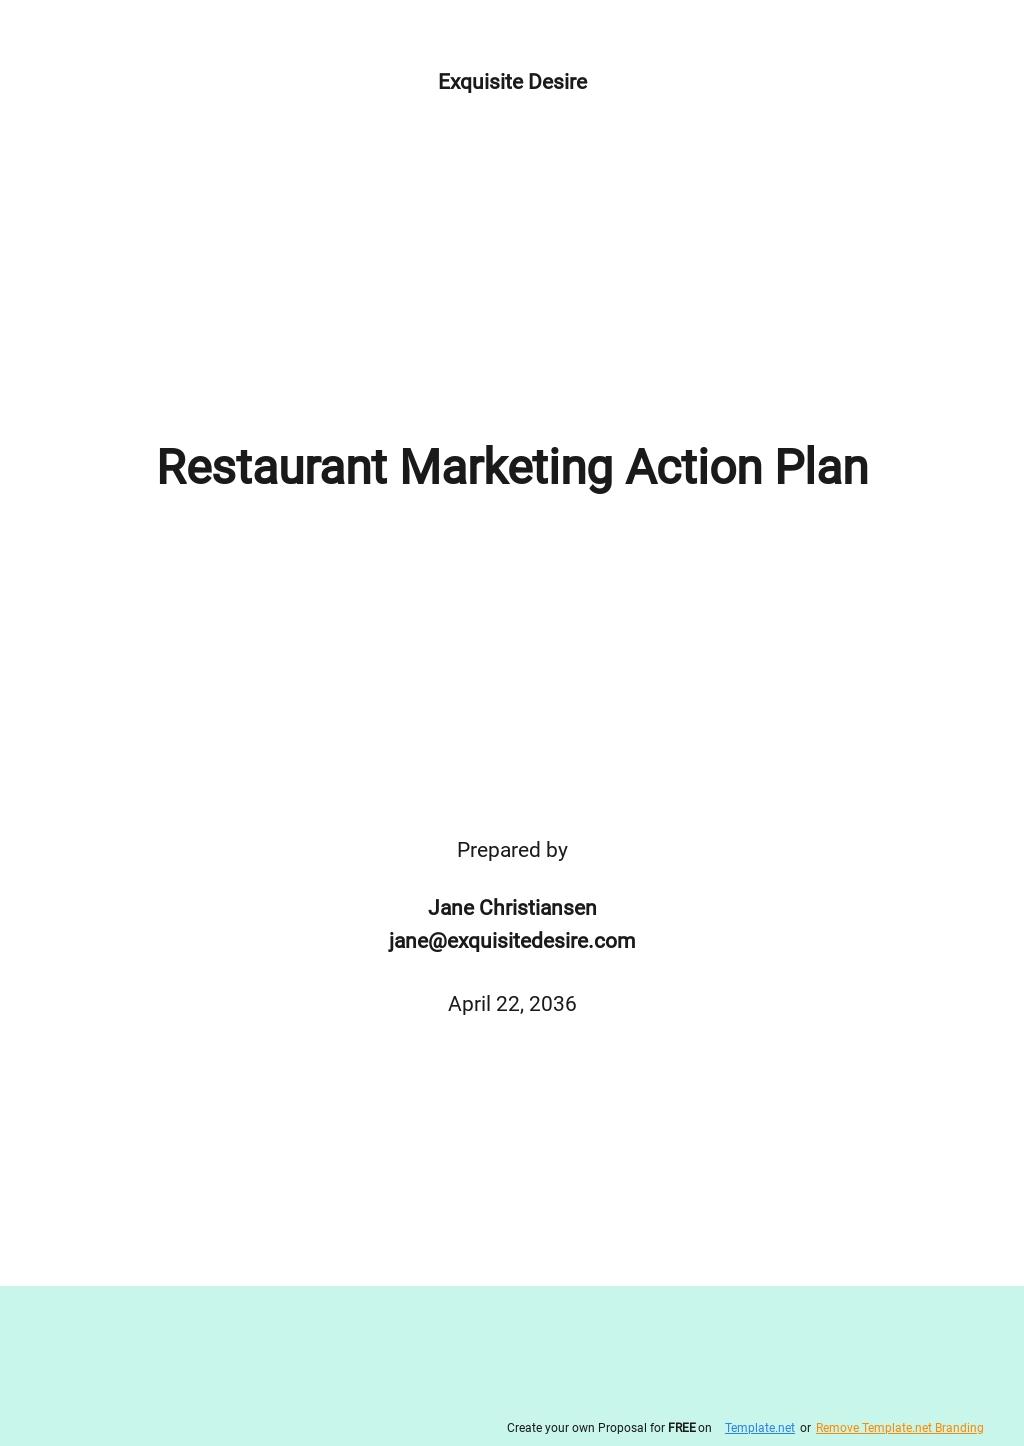 Restaurant Marketing Action Plan Template.jpe